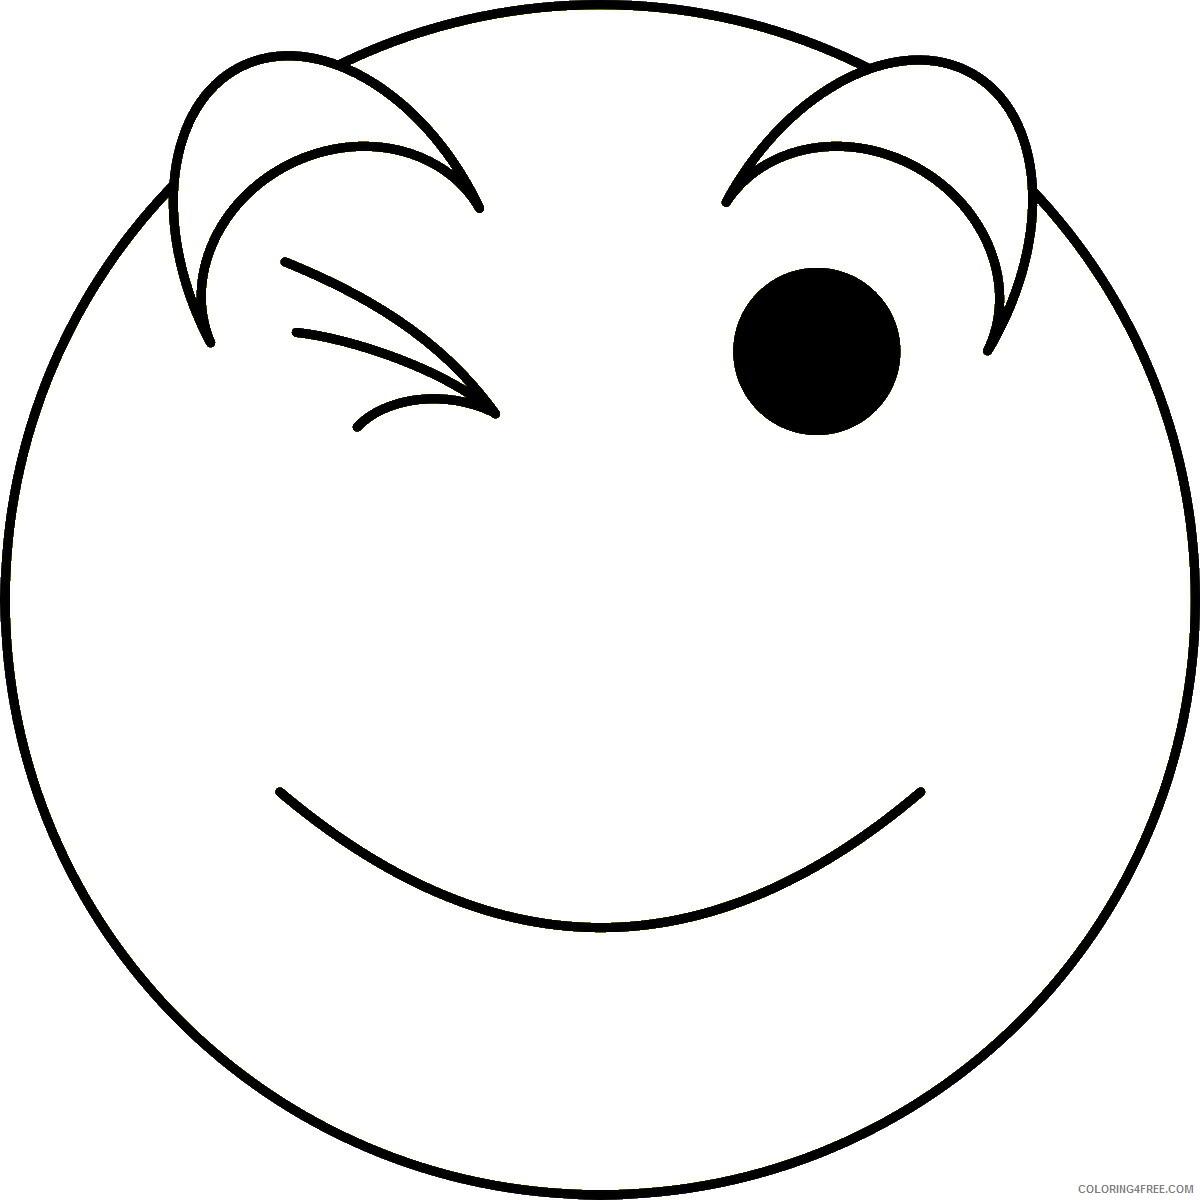 Emoji Coloring Pages emoji31 Printable 2021 2168 Coloring4free